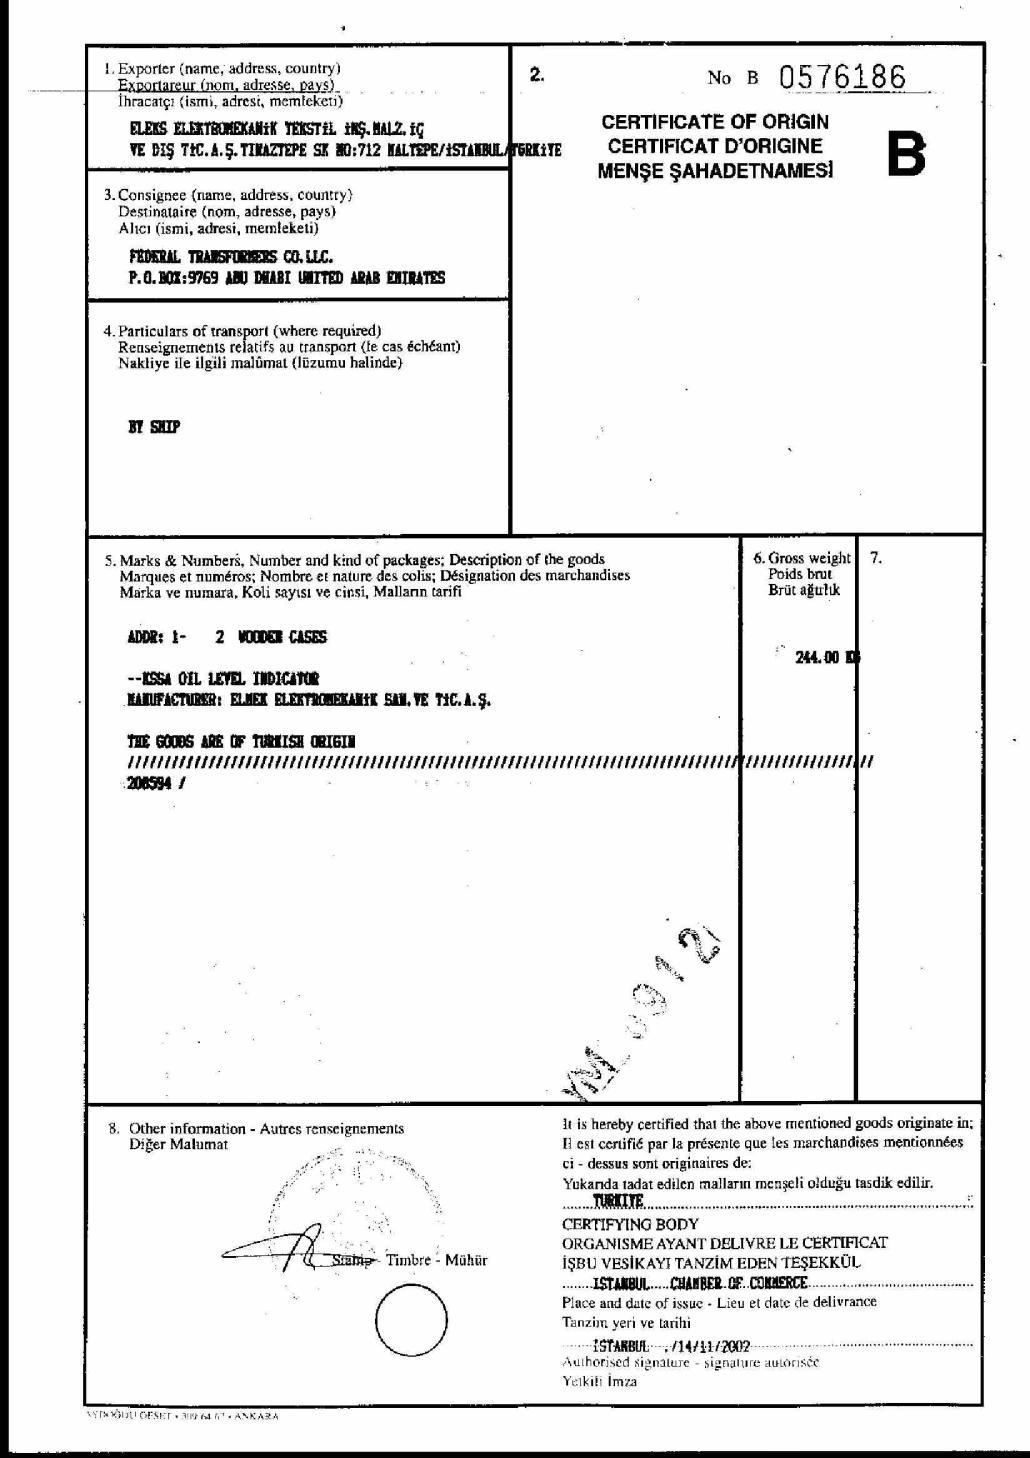 Certificate Of Origin Sample Letter from web.boun.edu.tr